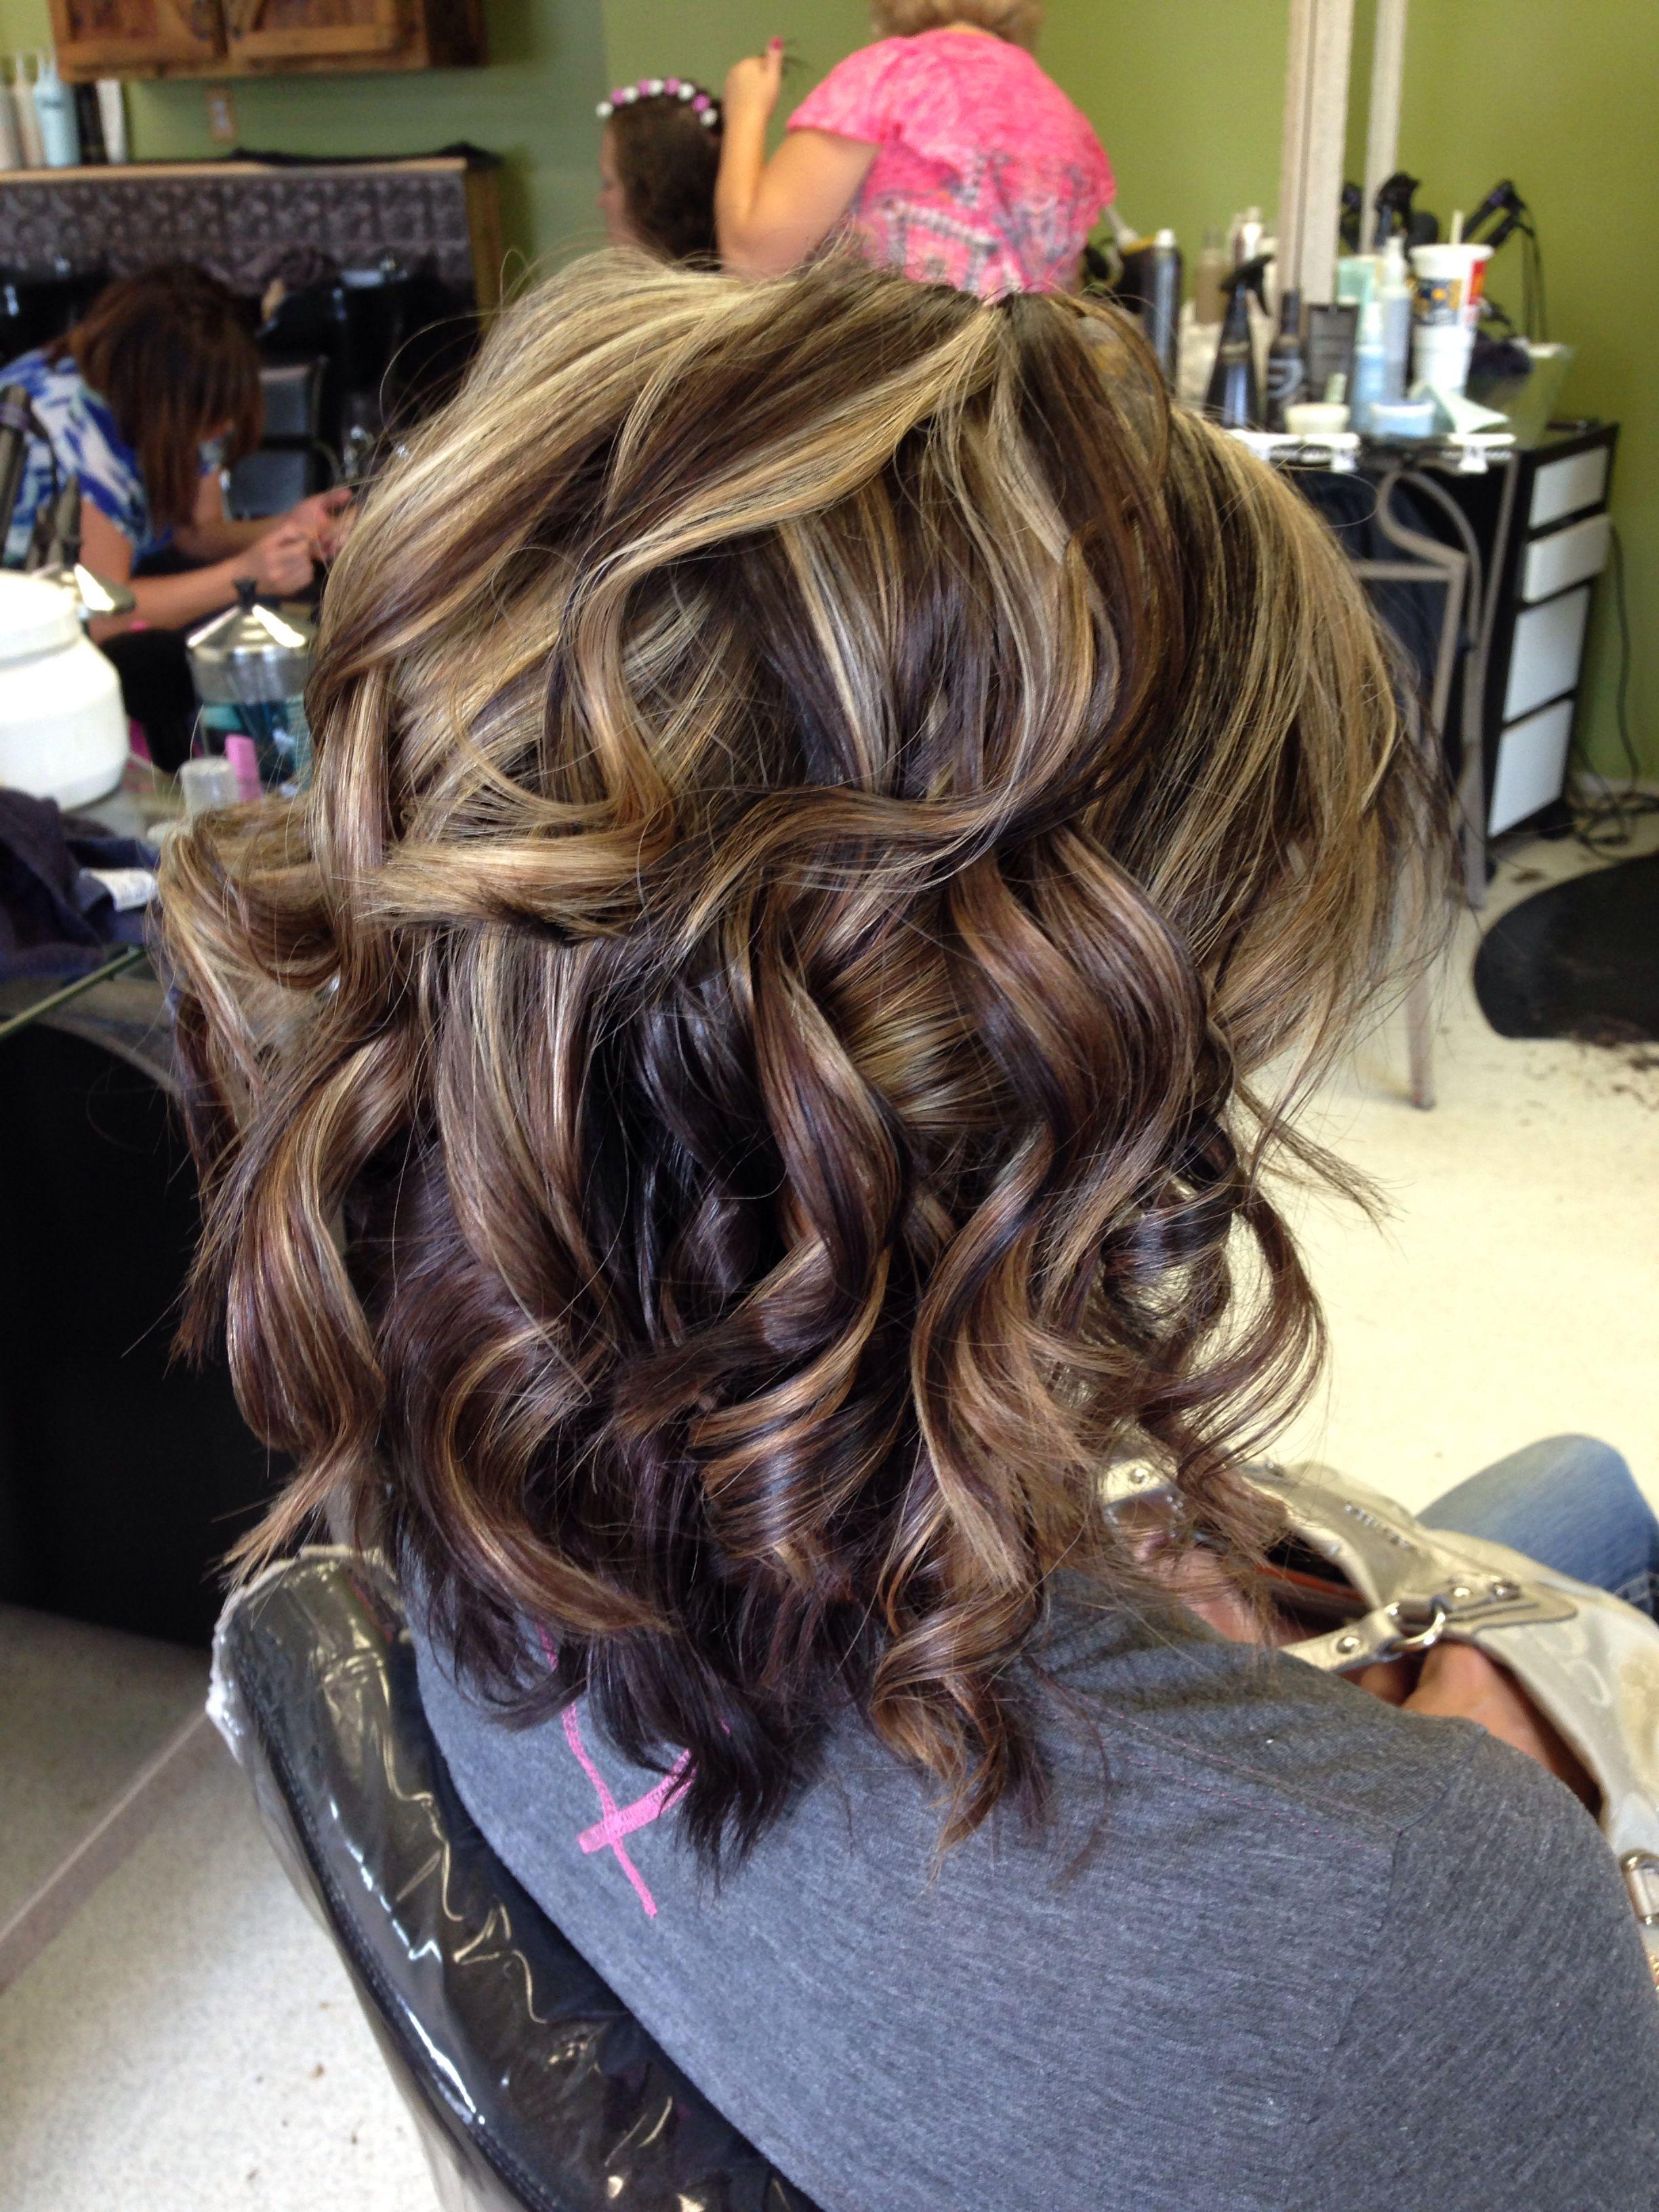 Hair By Trisha At Fringe Salon In Lennon Mi Hair Color